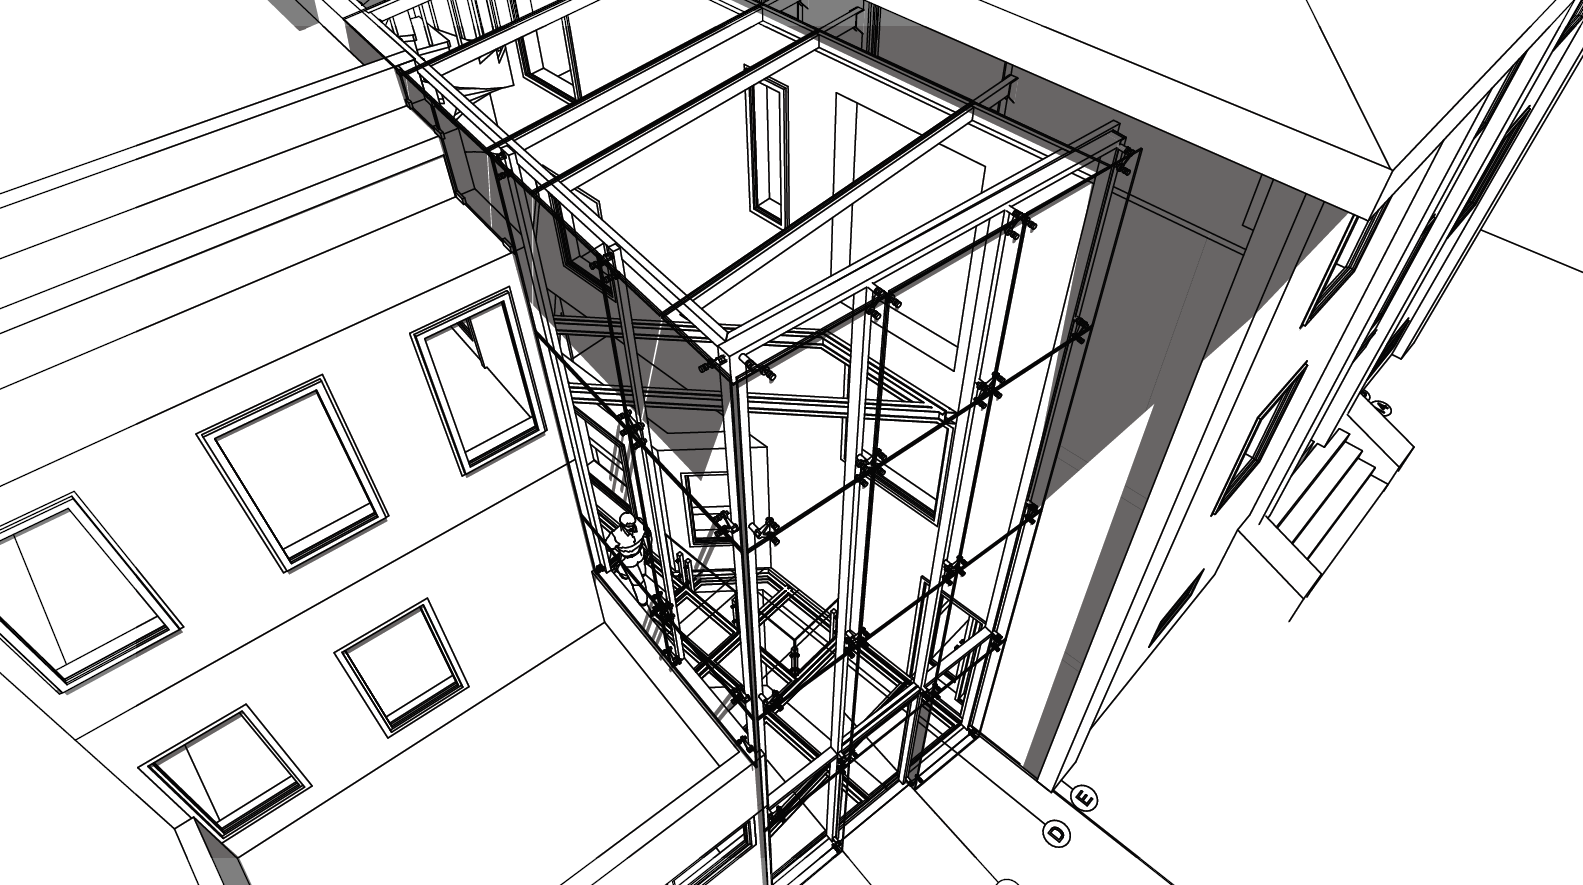 Edificio Nilontraro